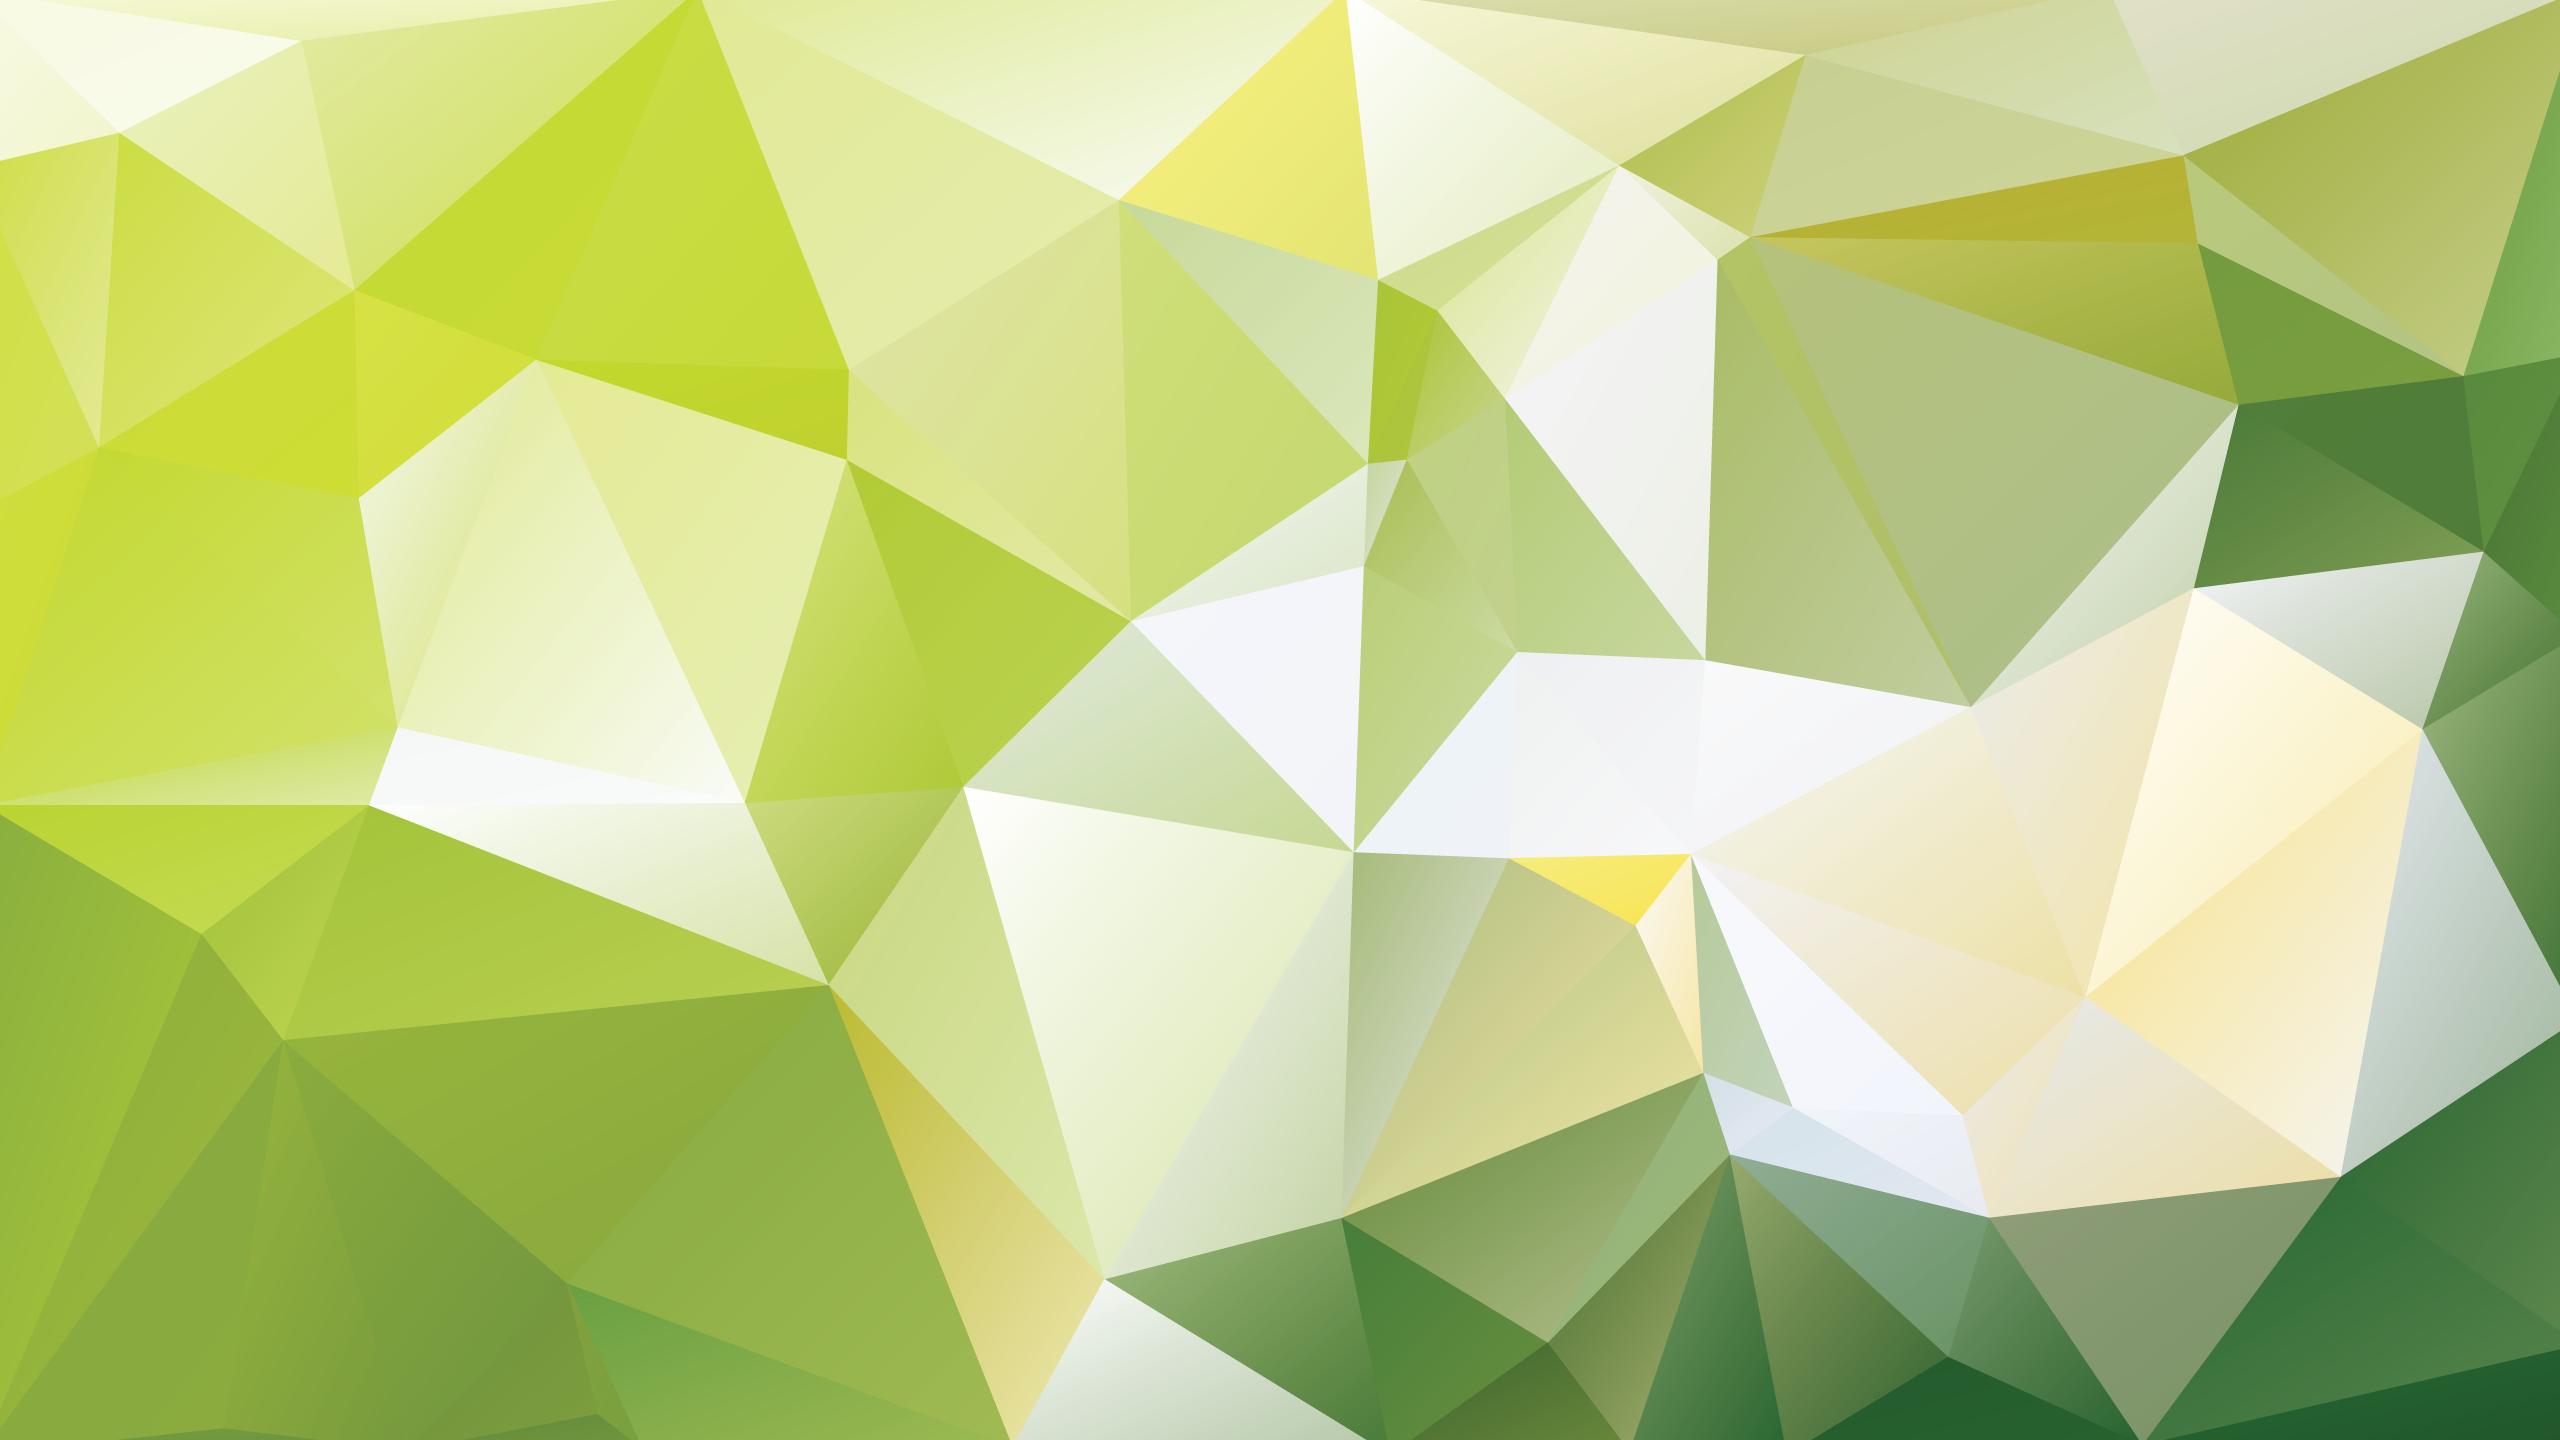 Wallpaper Illustration Symmetry Green Yellow Triangle Pattern